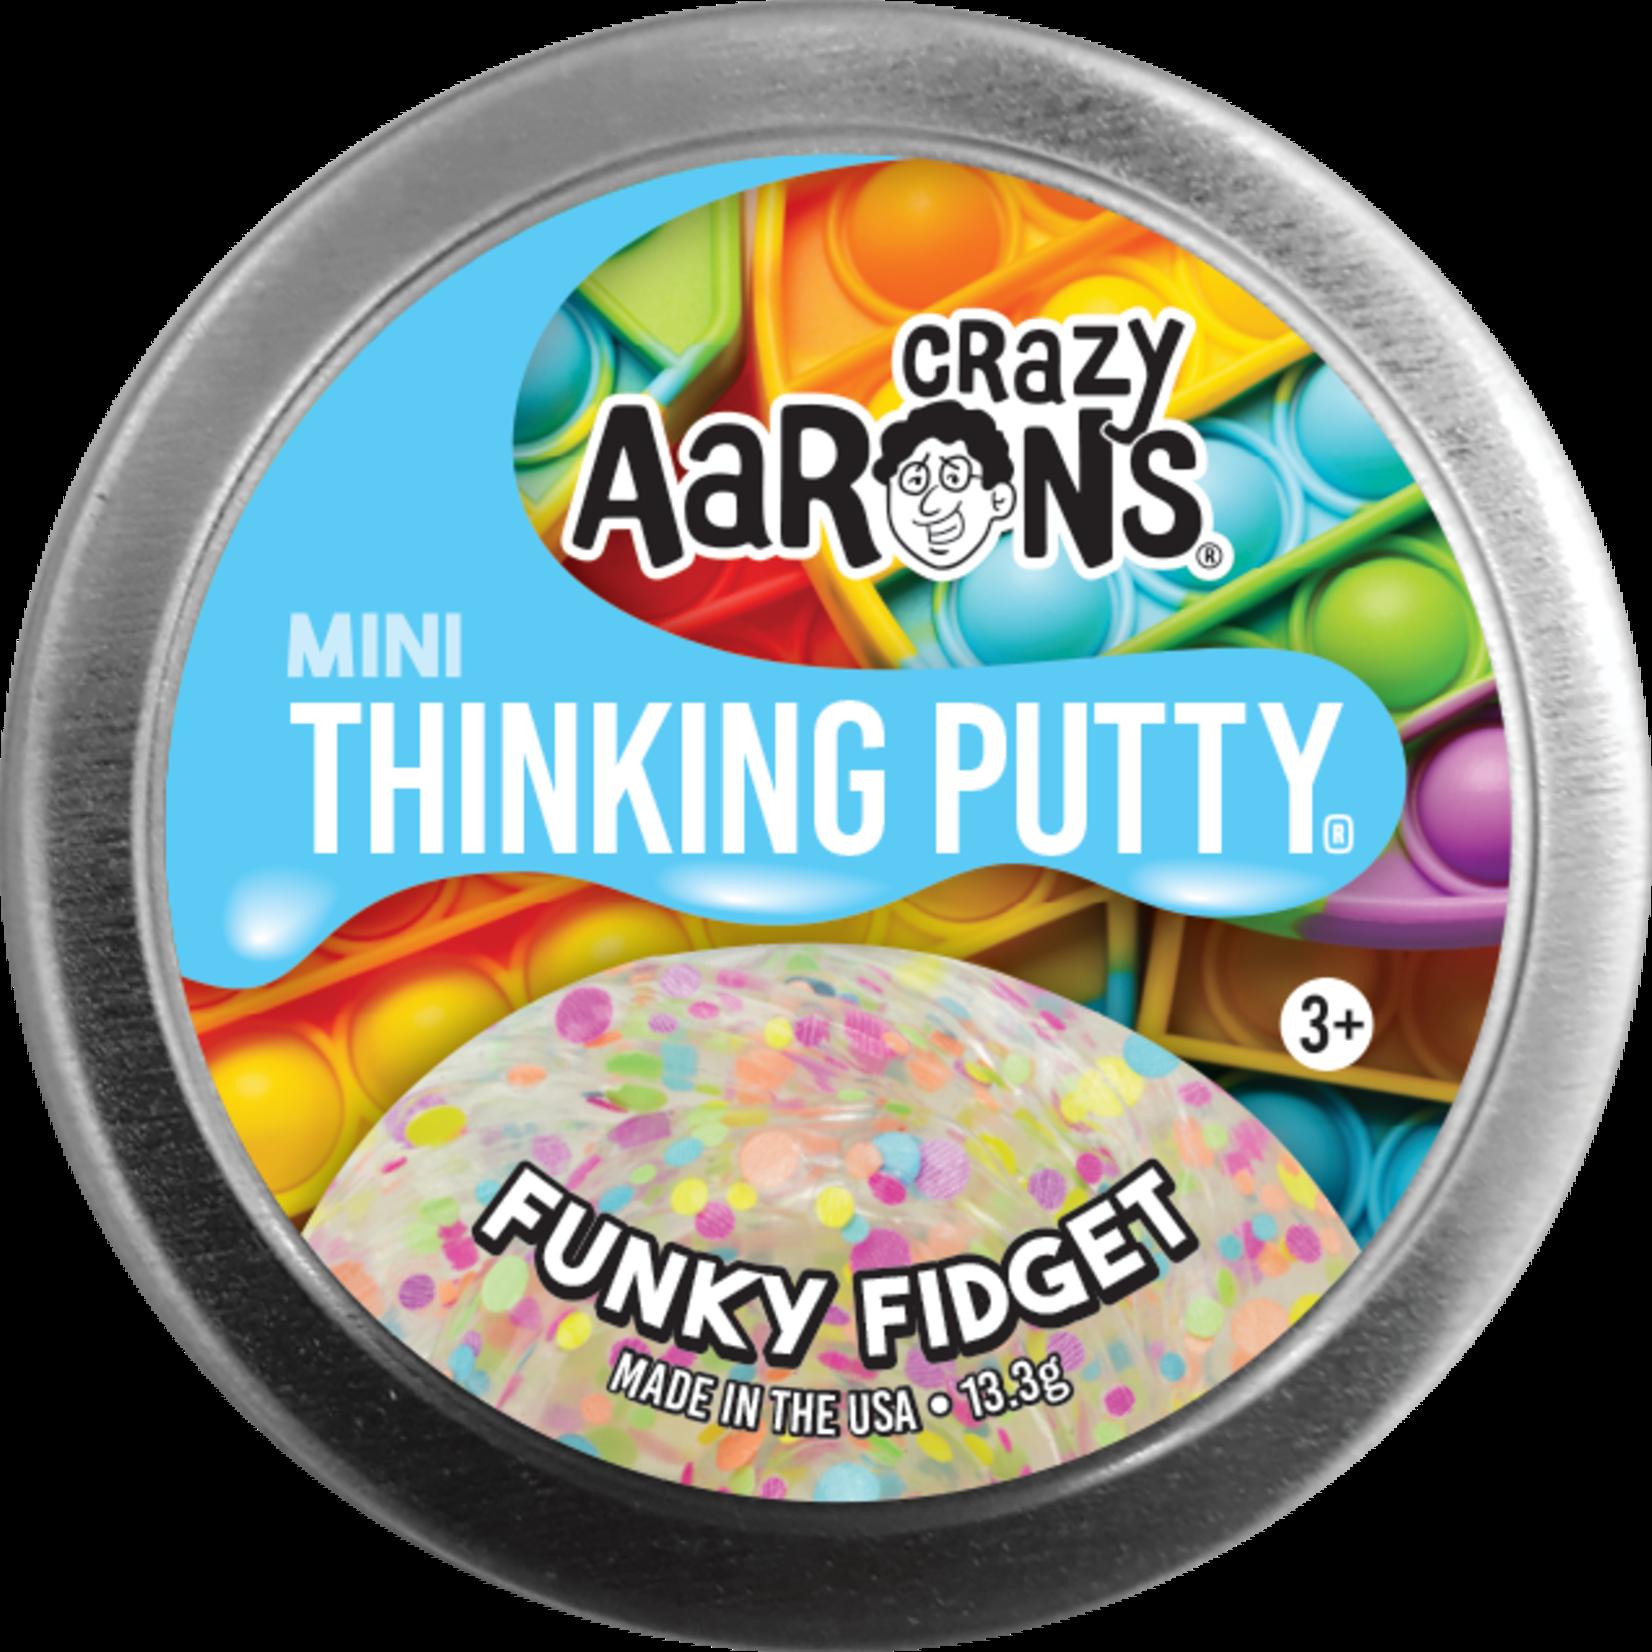 CRAZY AARON'S MINI FUNKY FIDGET